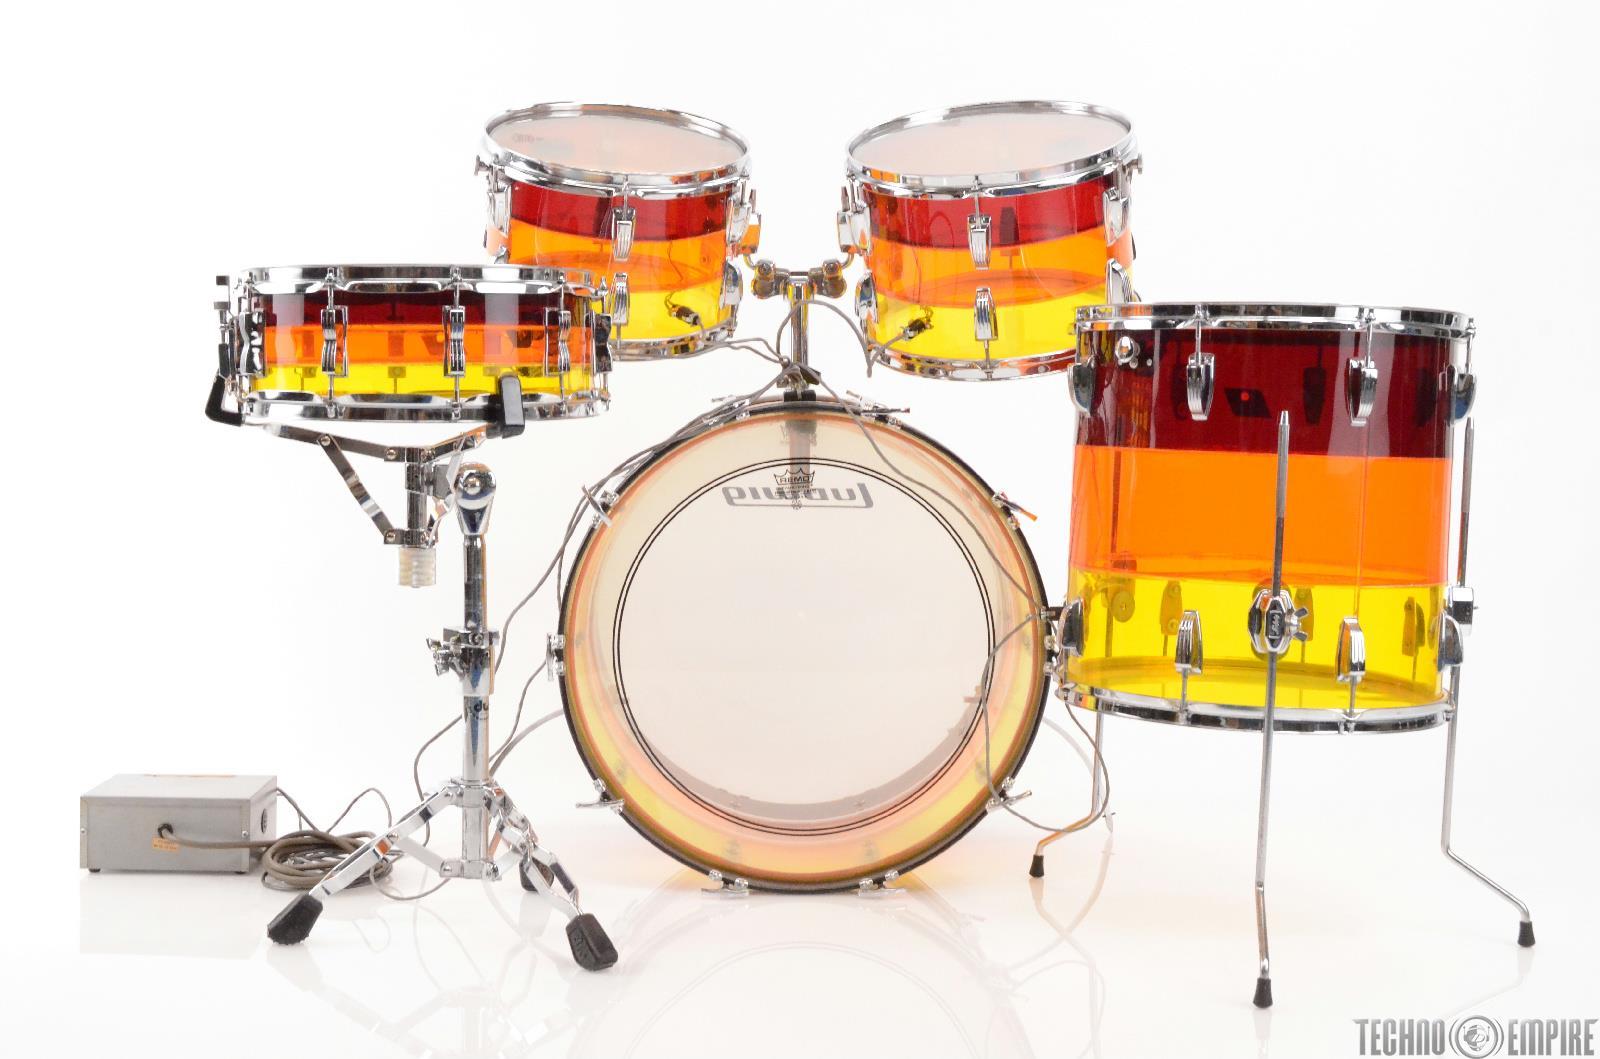 1978 LUDWIG Tivoli Vistalite Tequila Sunrise 5 Piece Drum Kit #27558